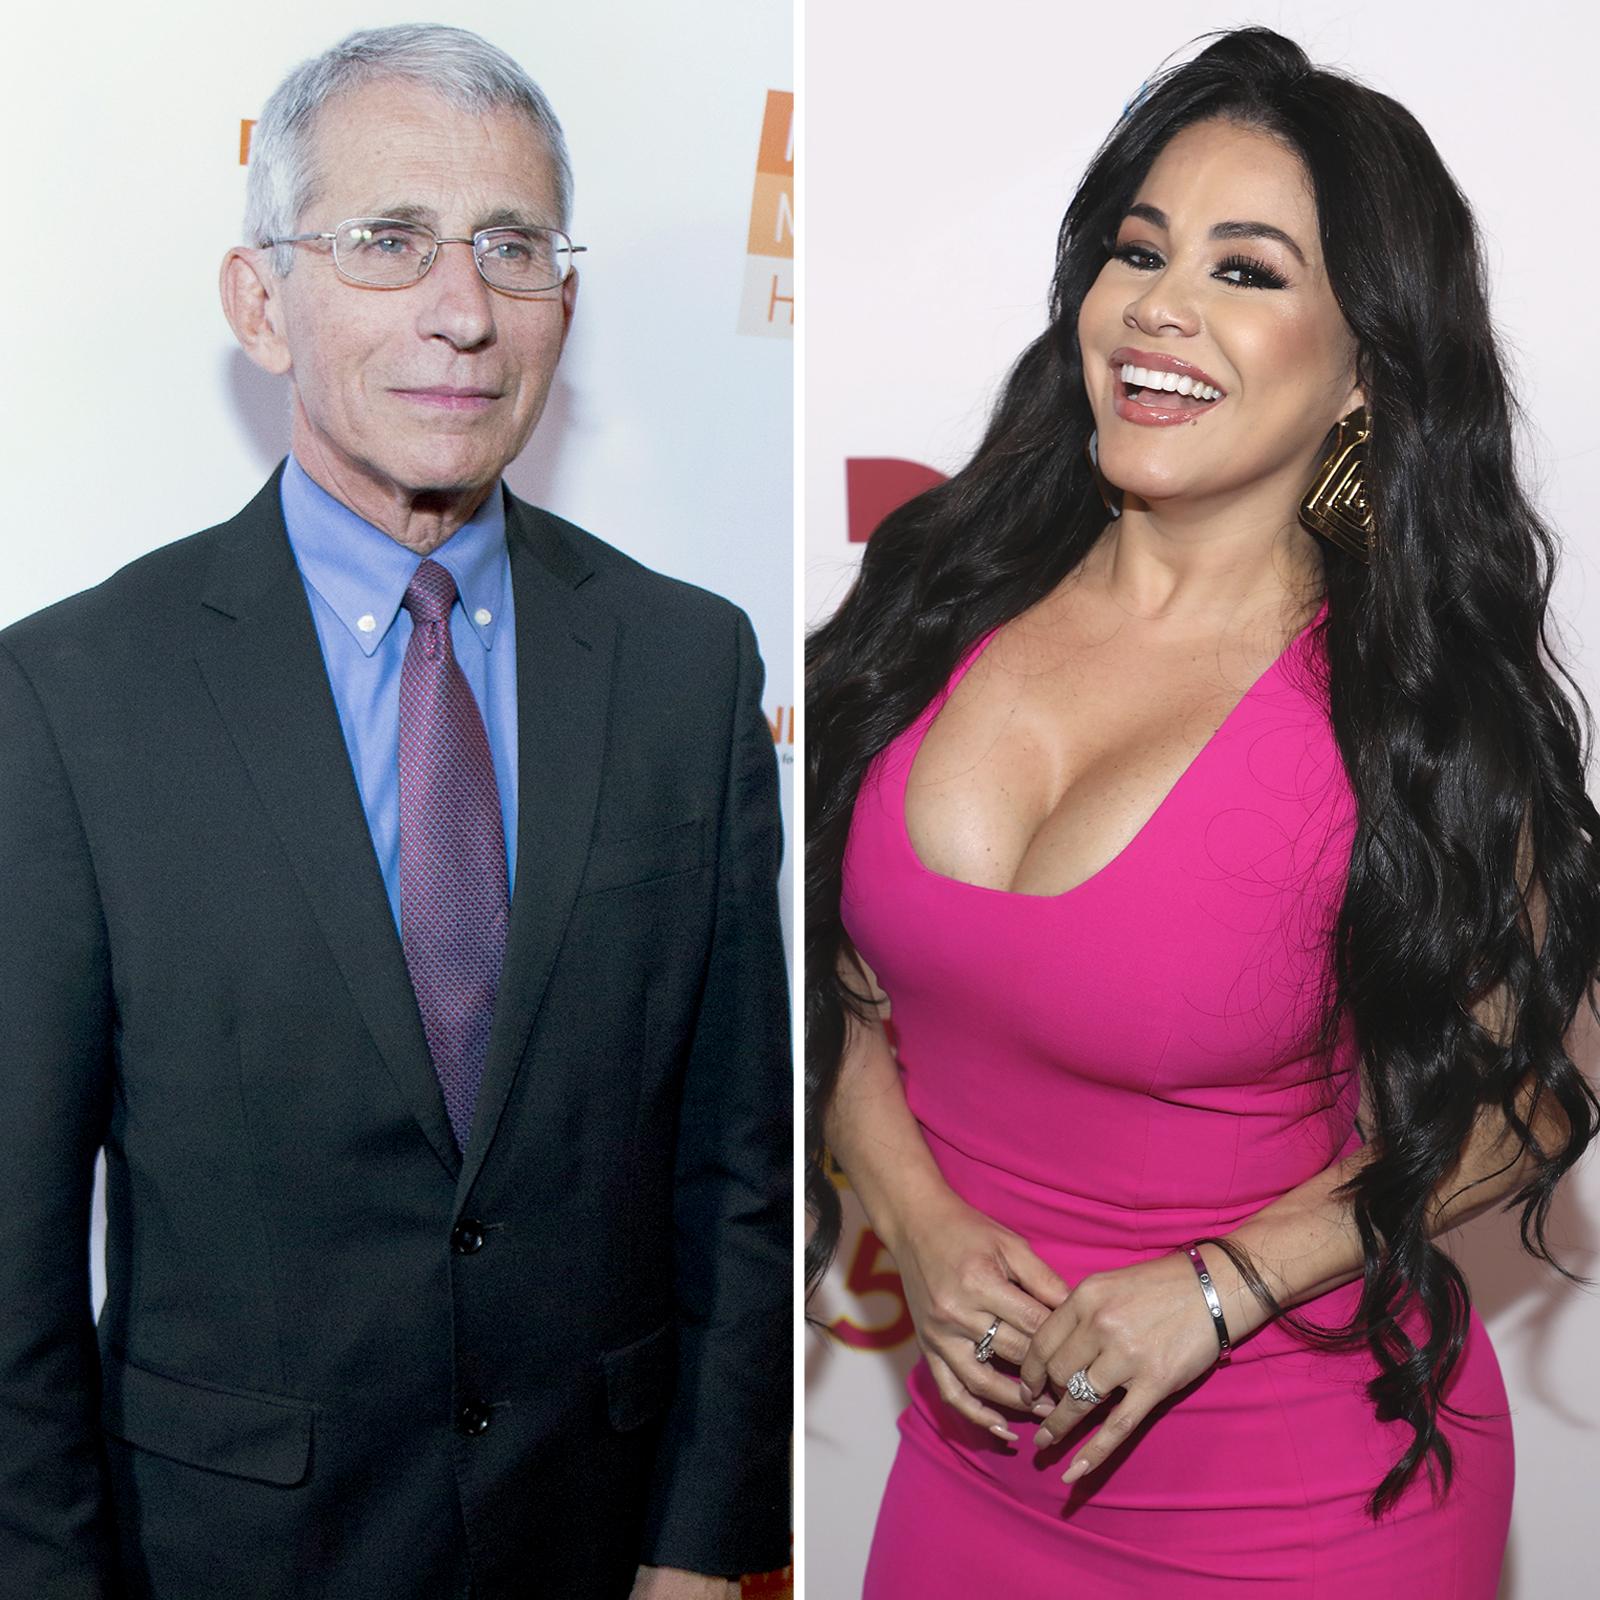 Dr. Anthony Fauci y Carolina Sandoval